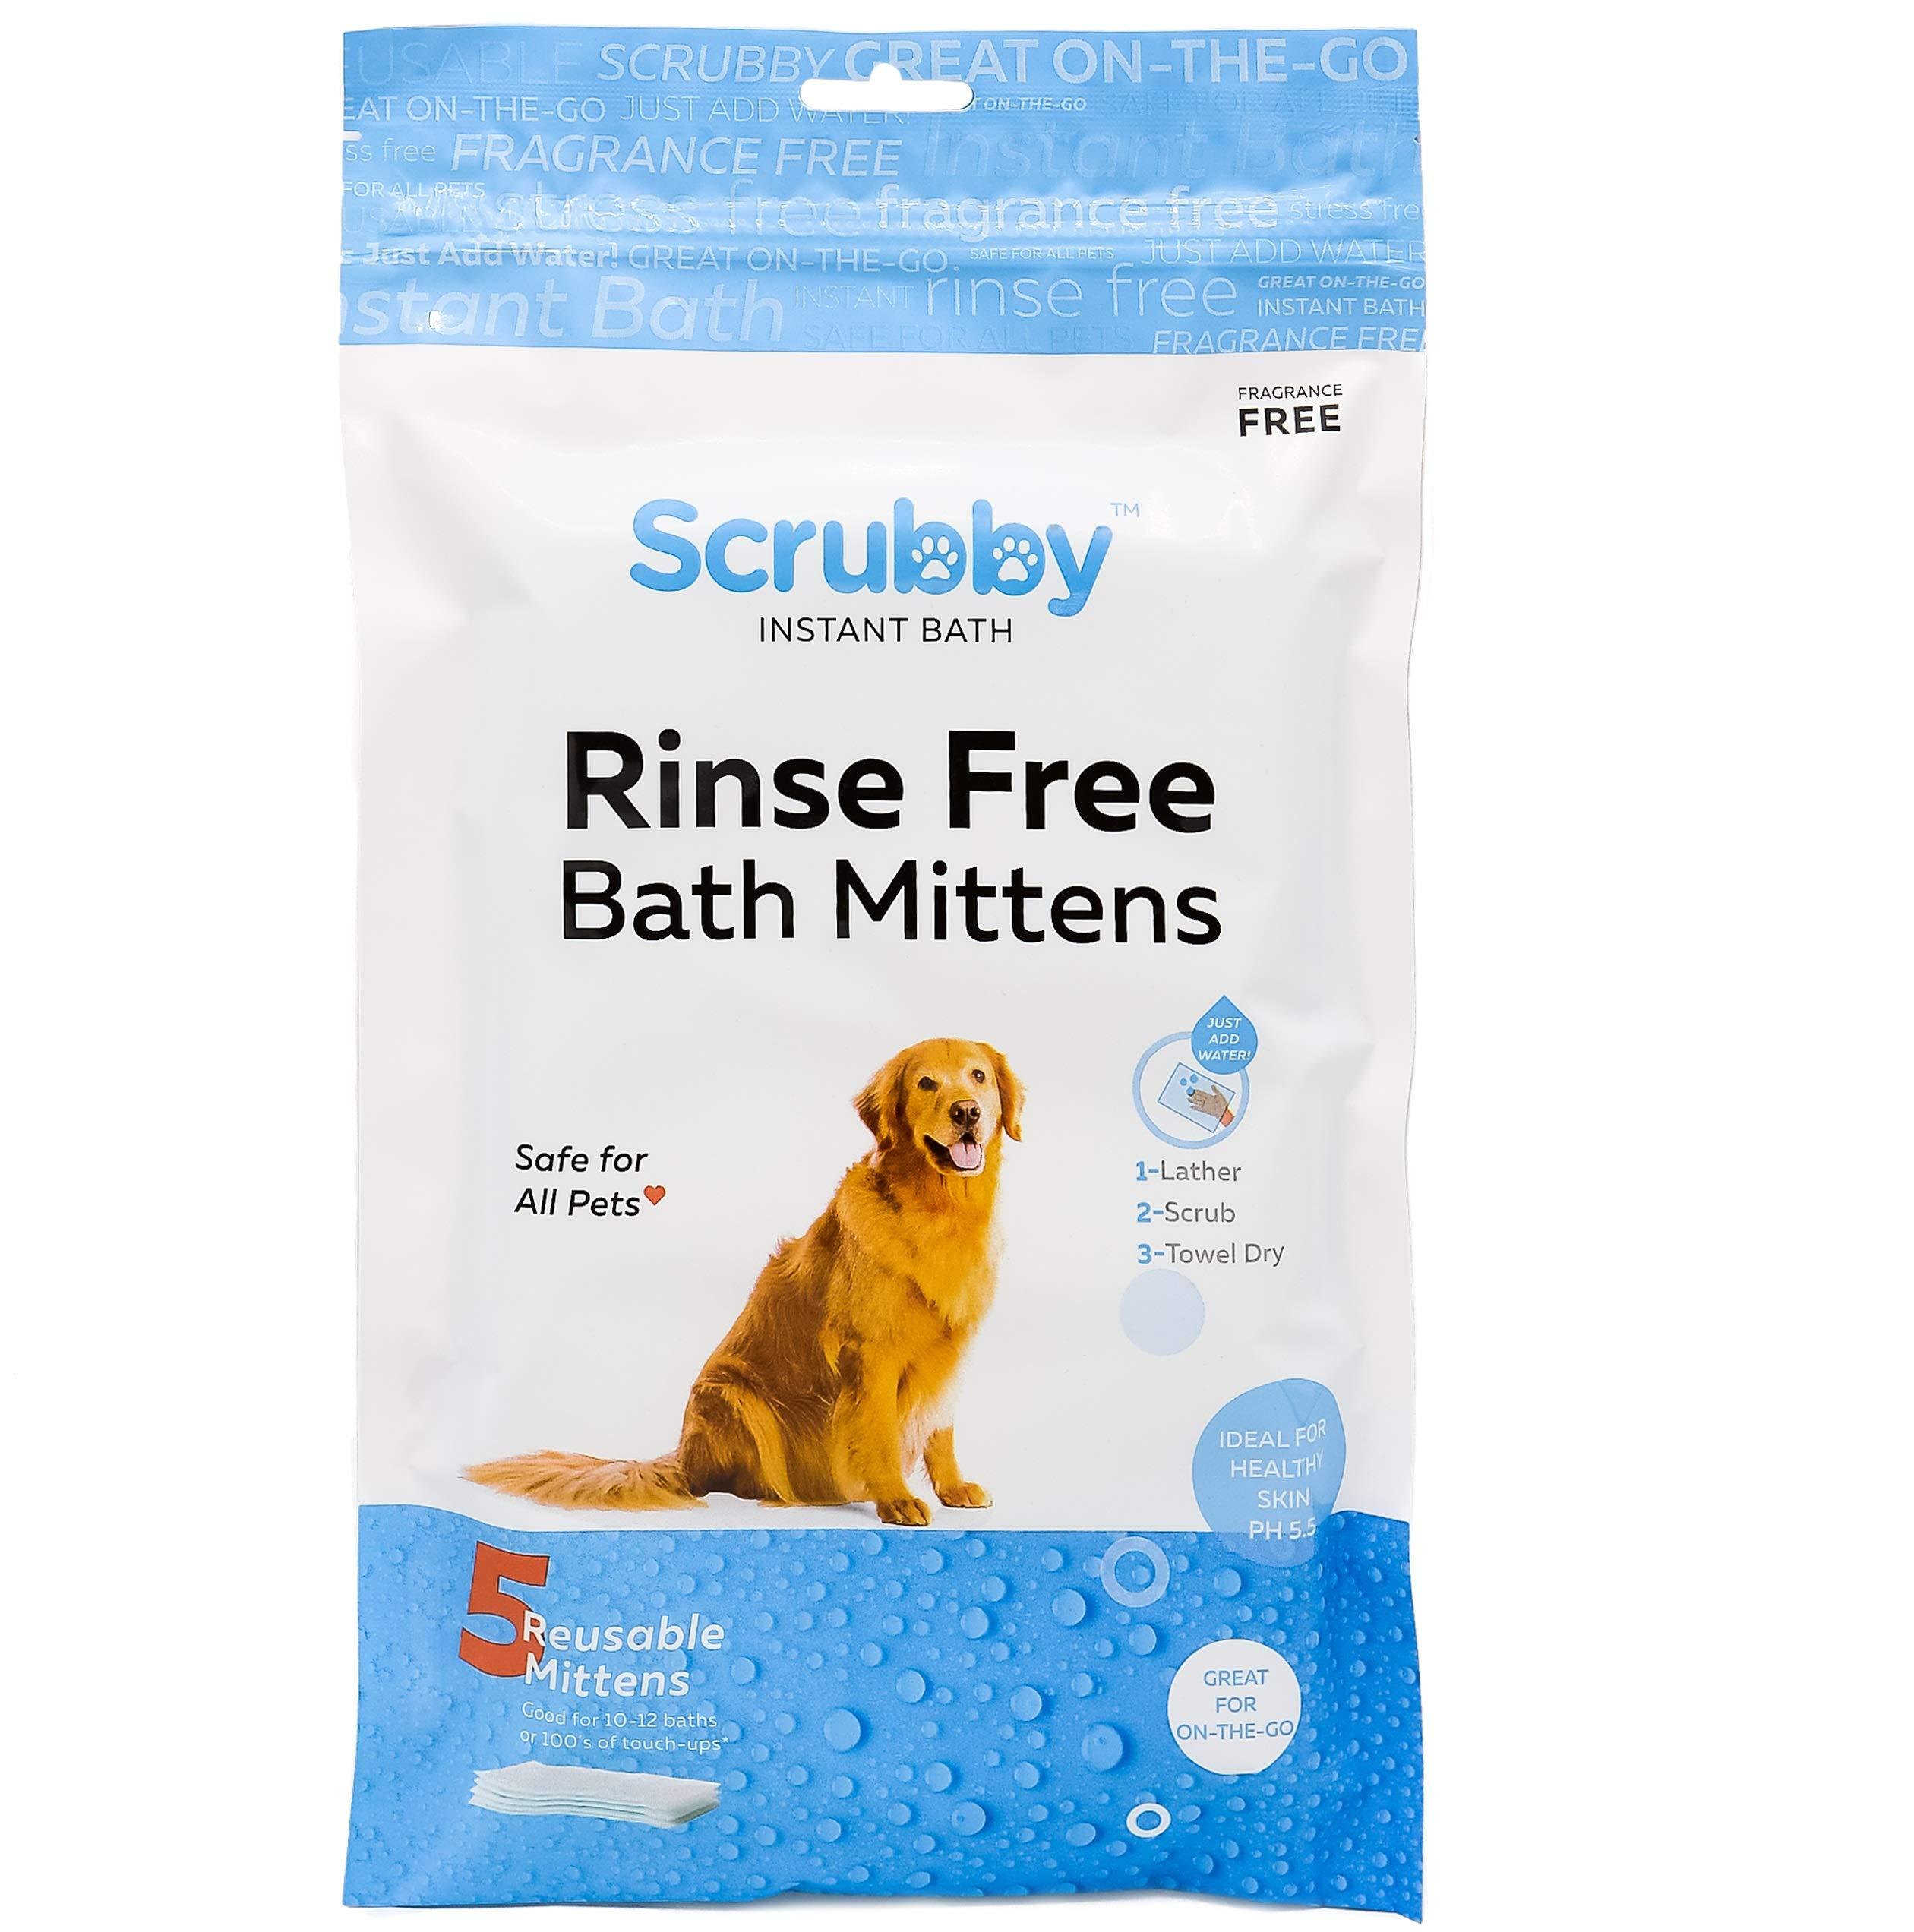 Rinse Free Bath Mittens Wipes